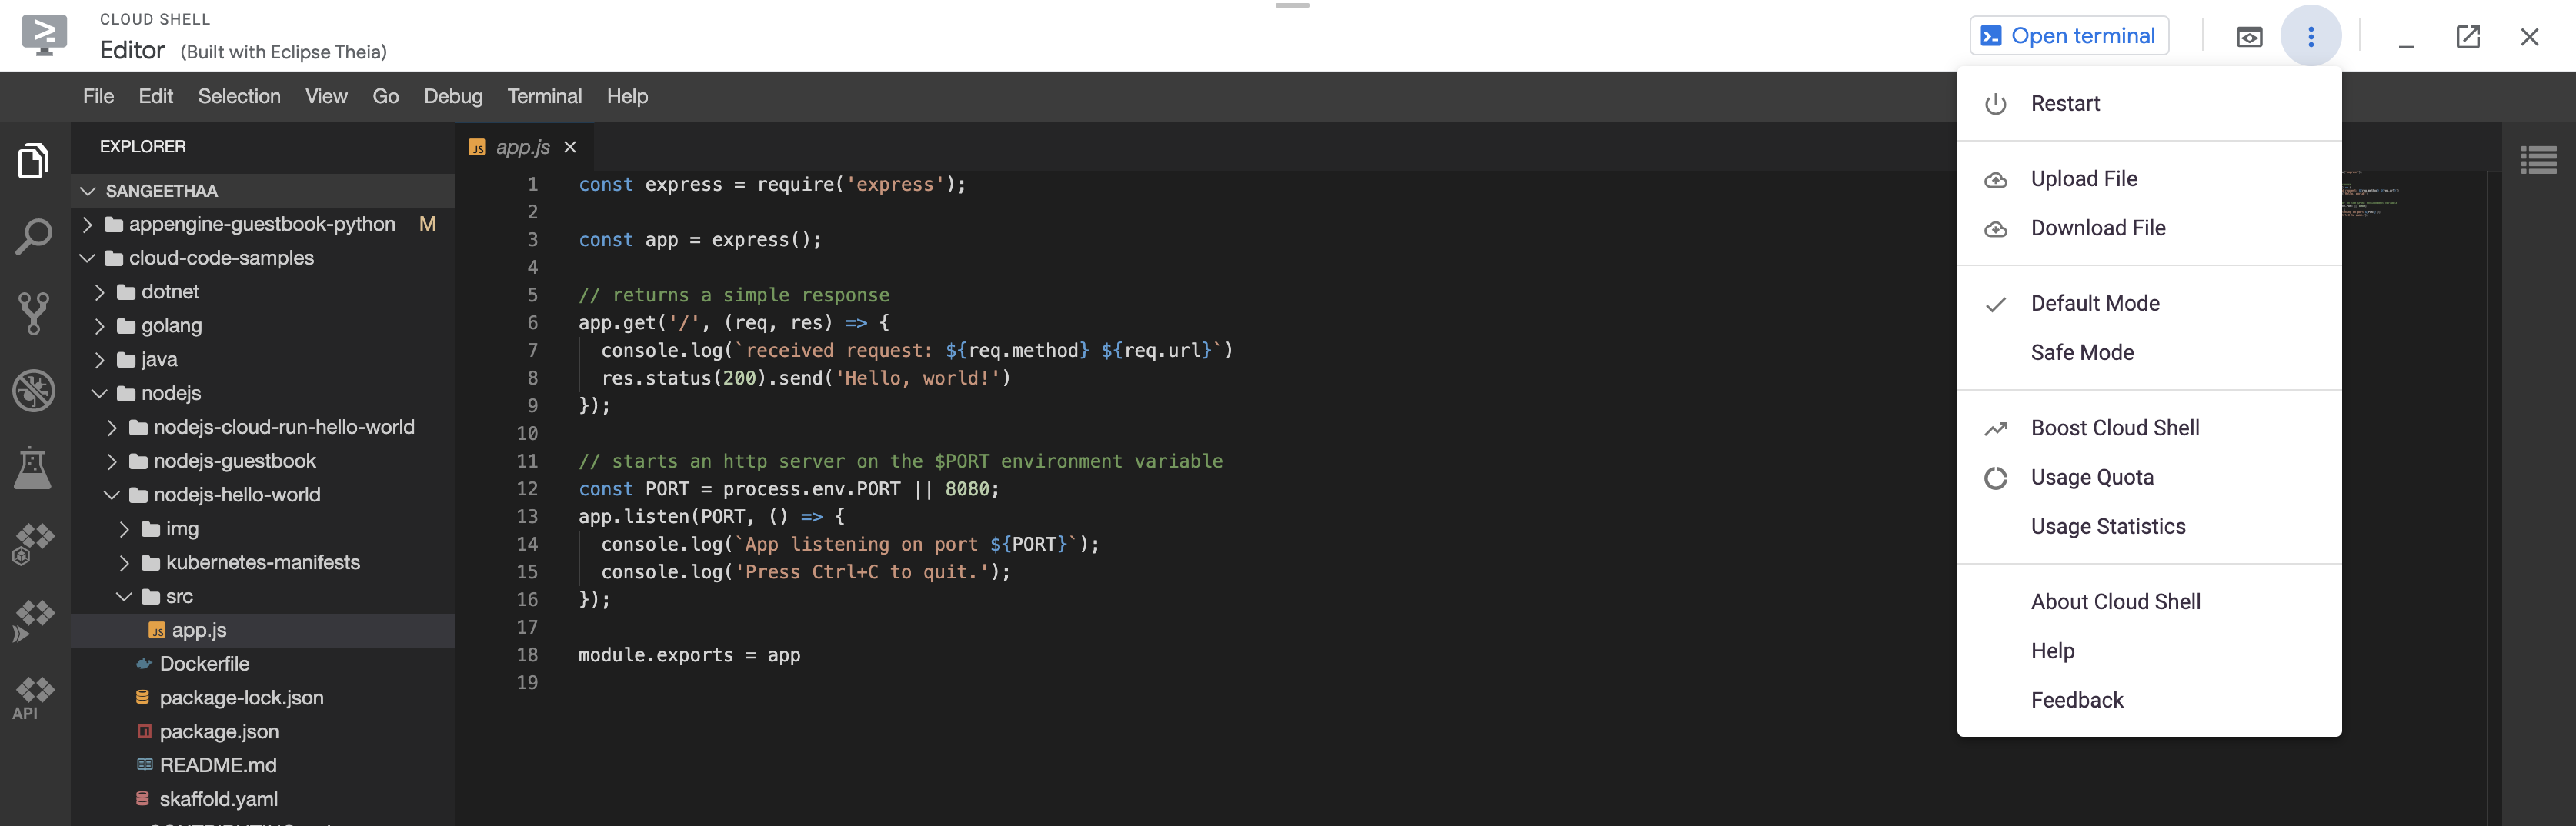 Cloud Shell 和編輯器工作階段